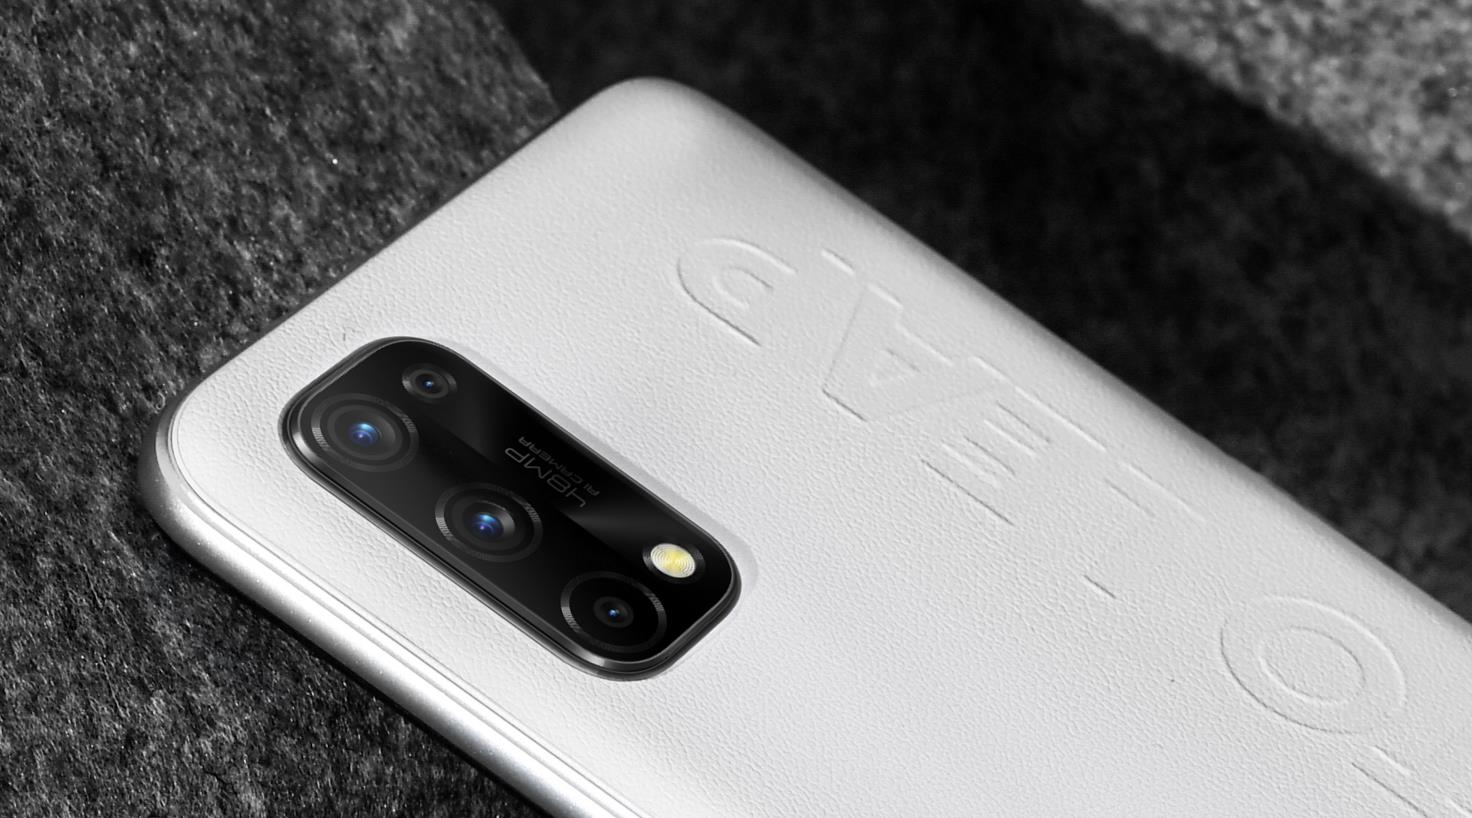 realme Q2 Pro屏幕刷新率是多少?屏幕材质是什么?